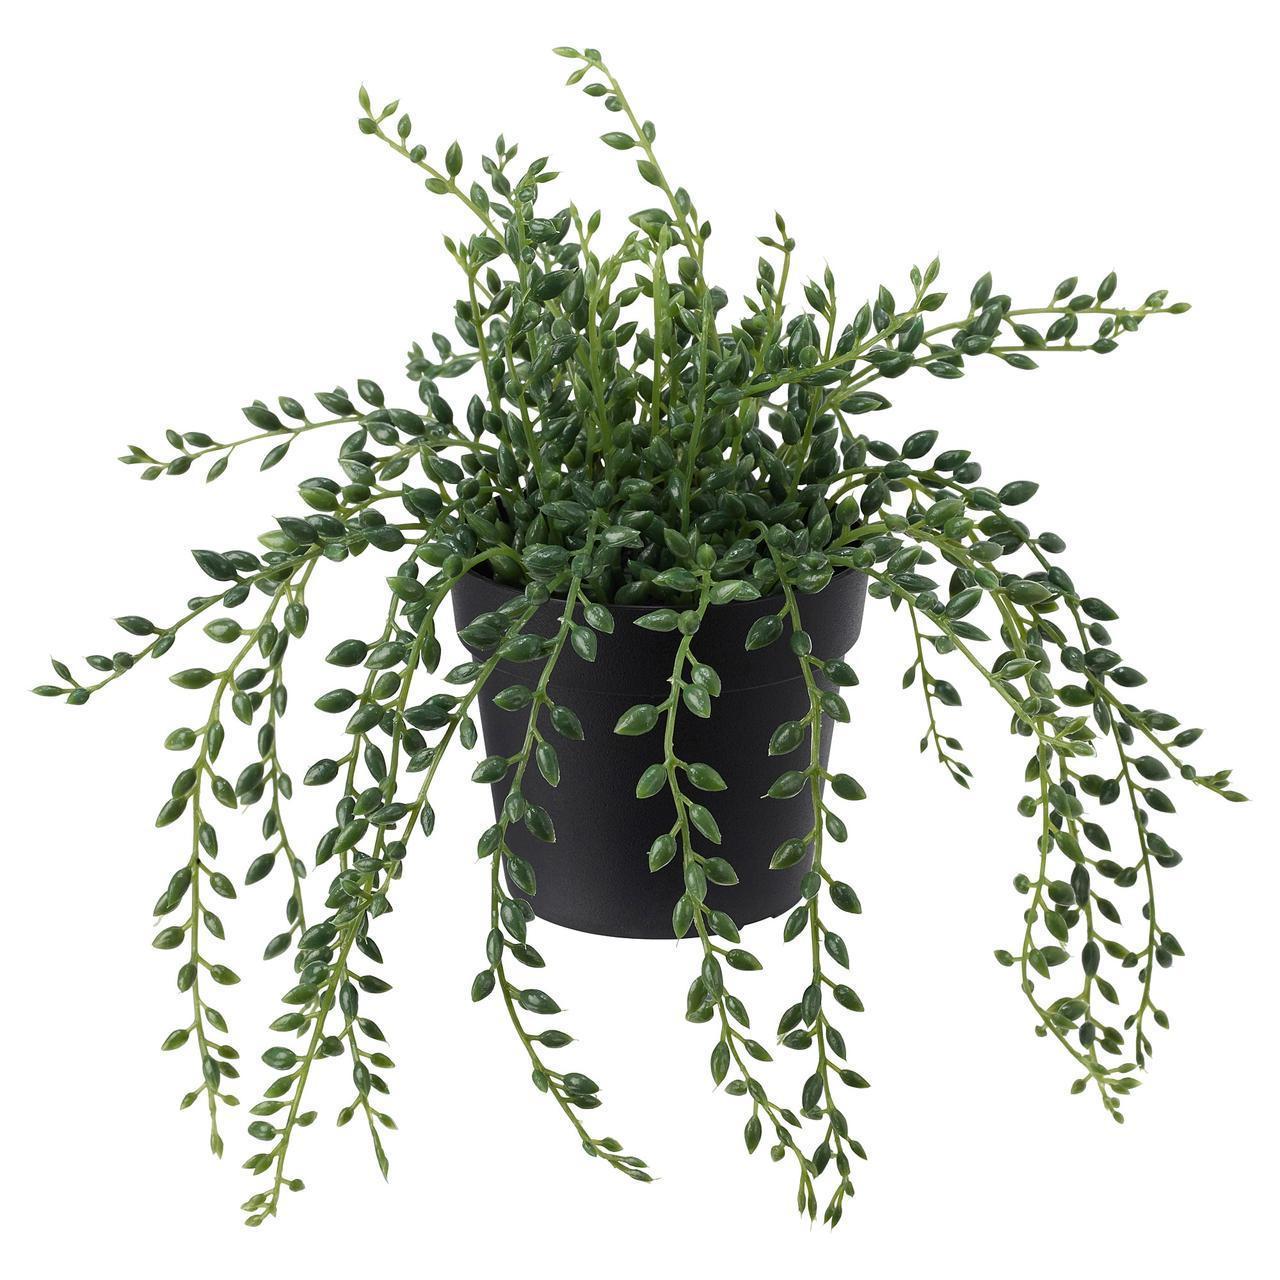 Штучне рослина в горщику IKEA FEJKA 9 см Sznur korali 303.953.40